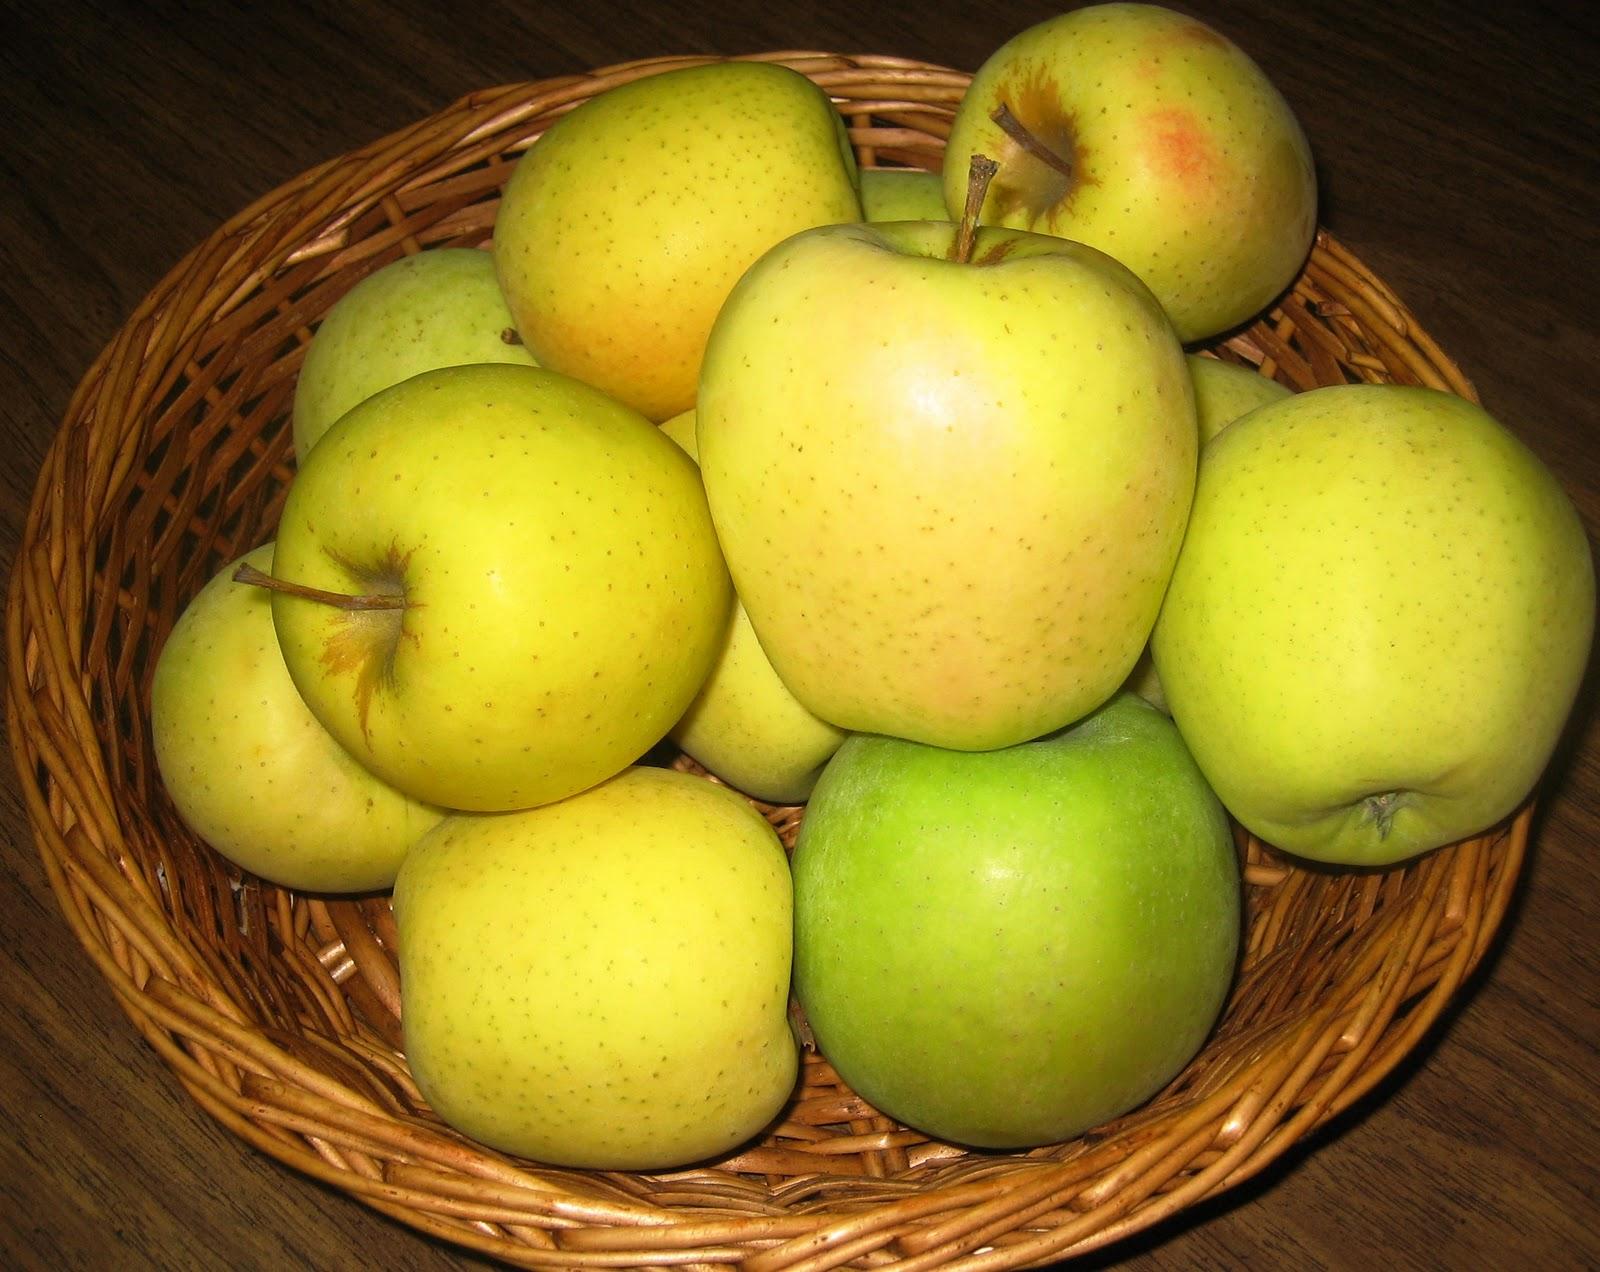 la casa e il giardino baked apples simple dessert without guilt mele al forno semplice. Black Bedroom Furniture Sets. Home Design Ideas